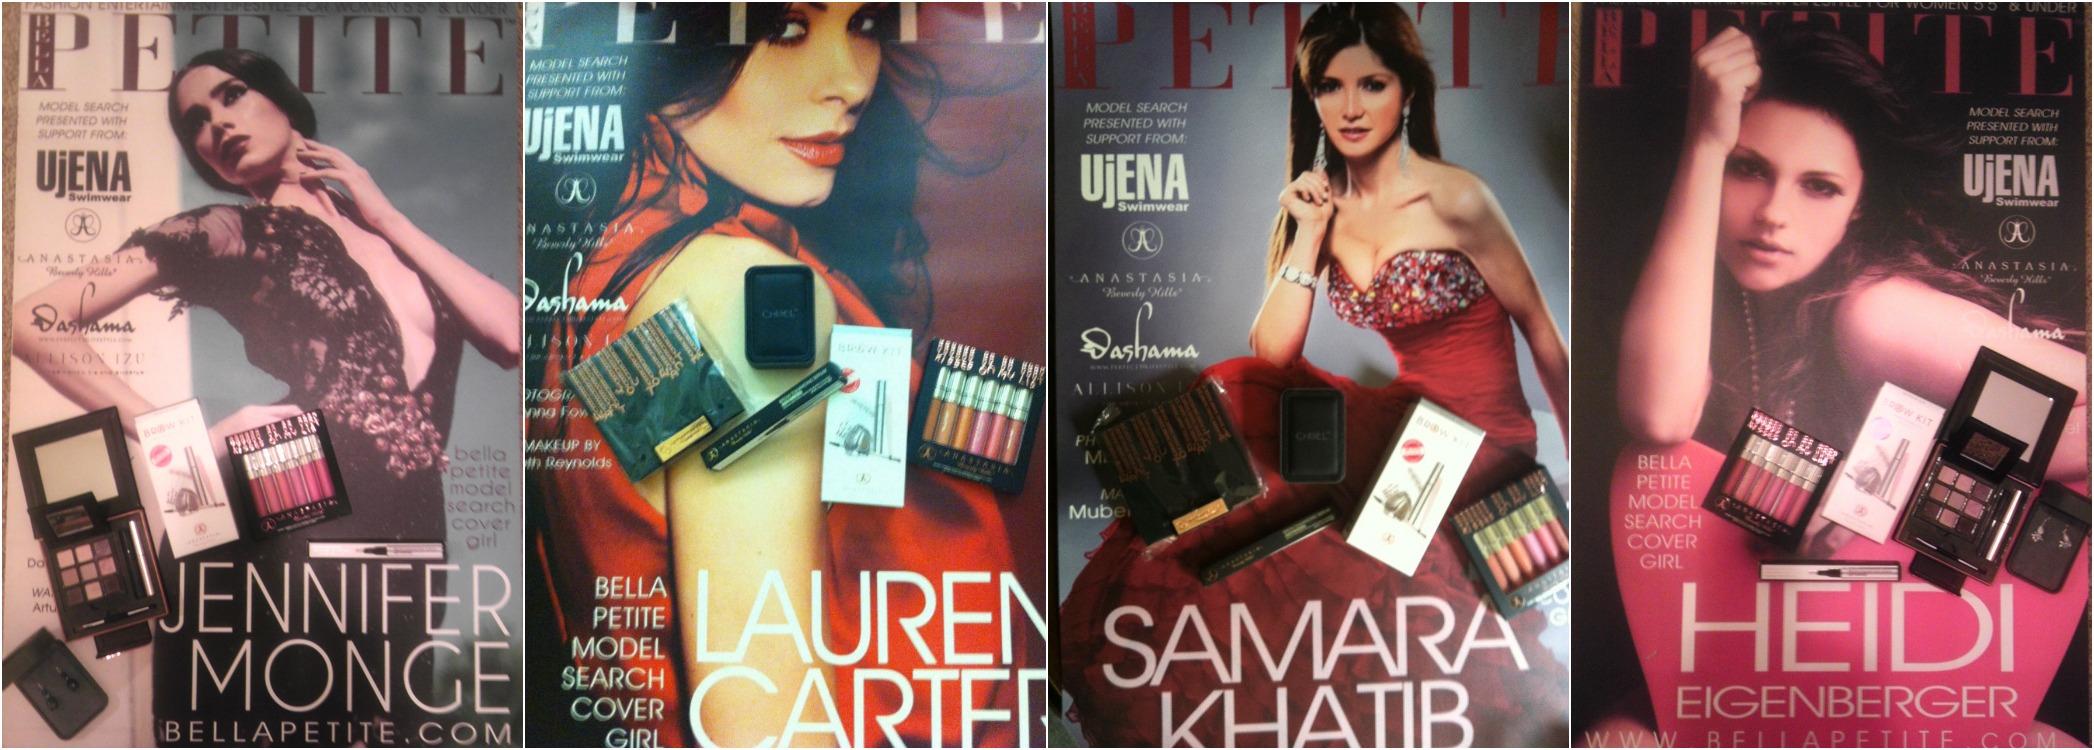 Bella-Petite-Model-Search-Sponsor-Gifts